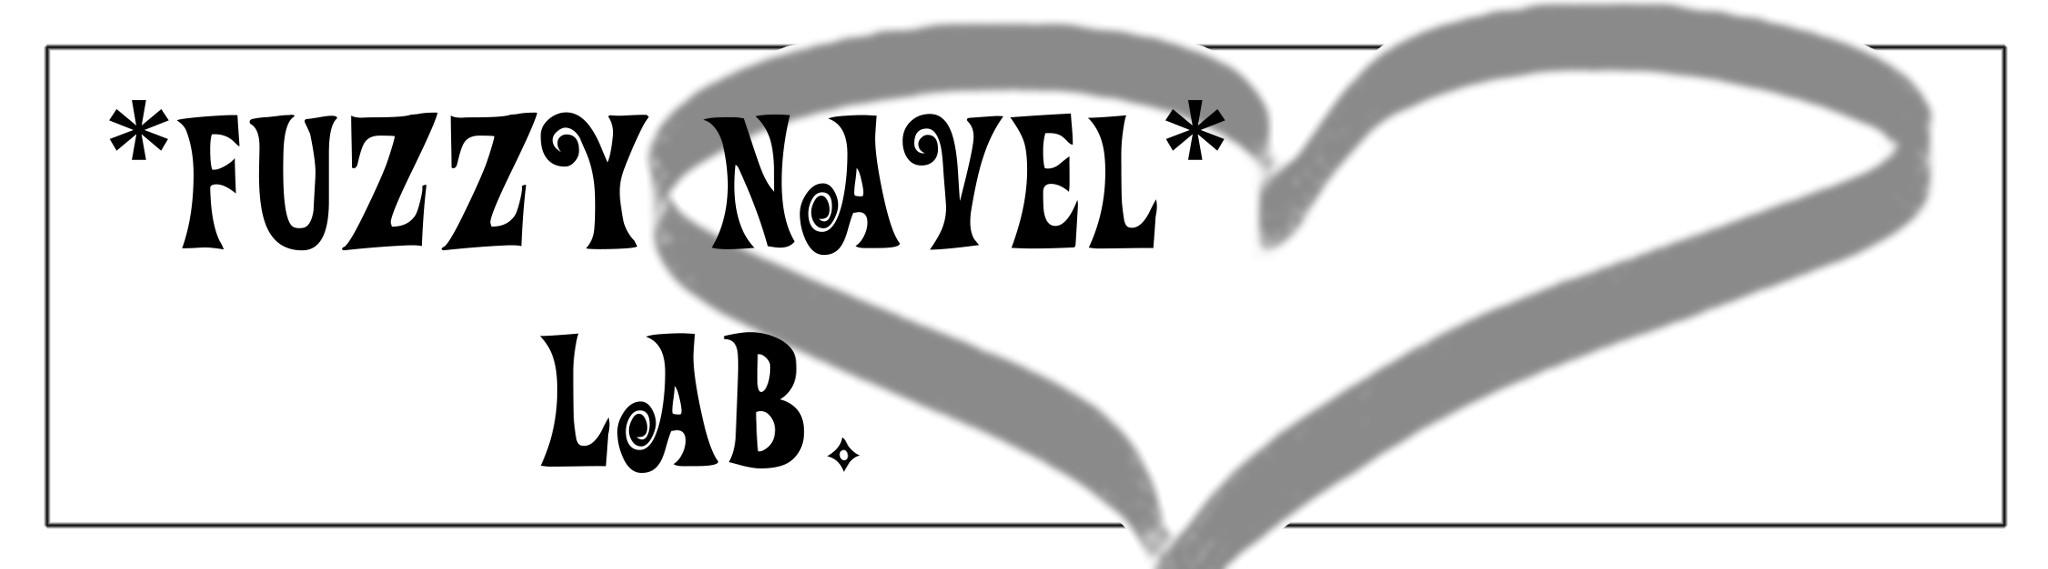 Fuzzy Navel Lab WEB SHOP